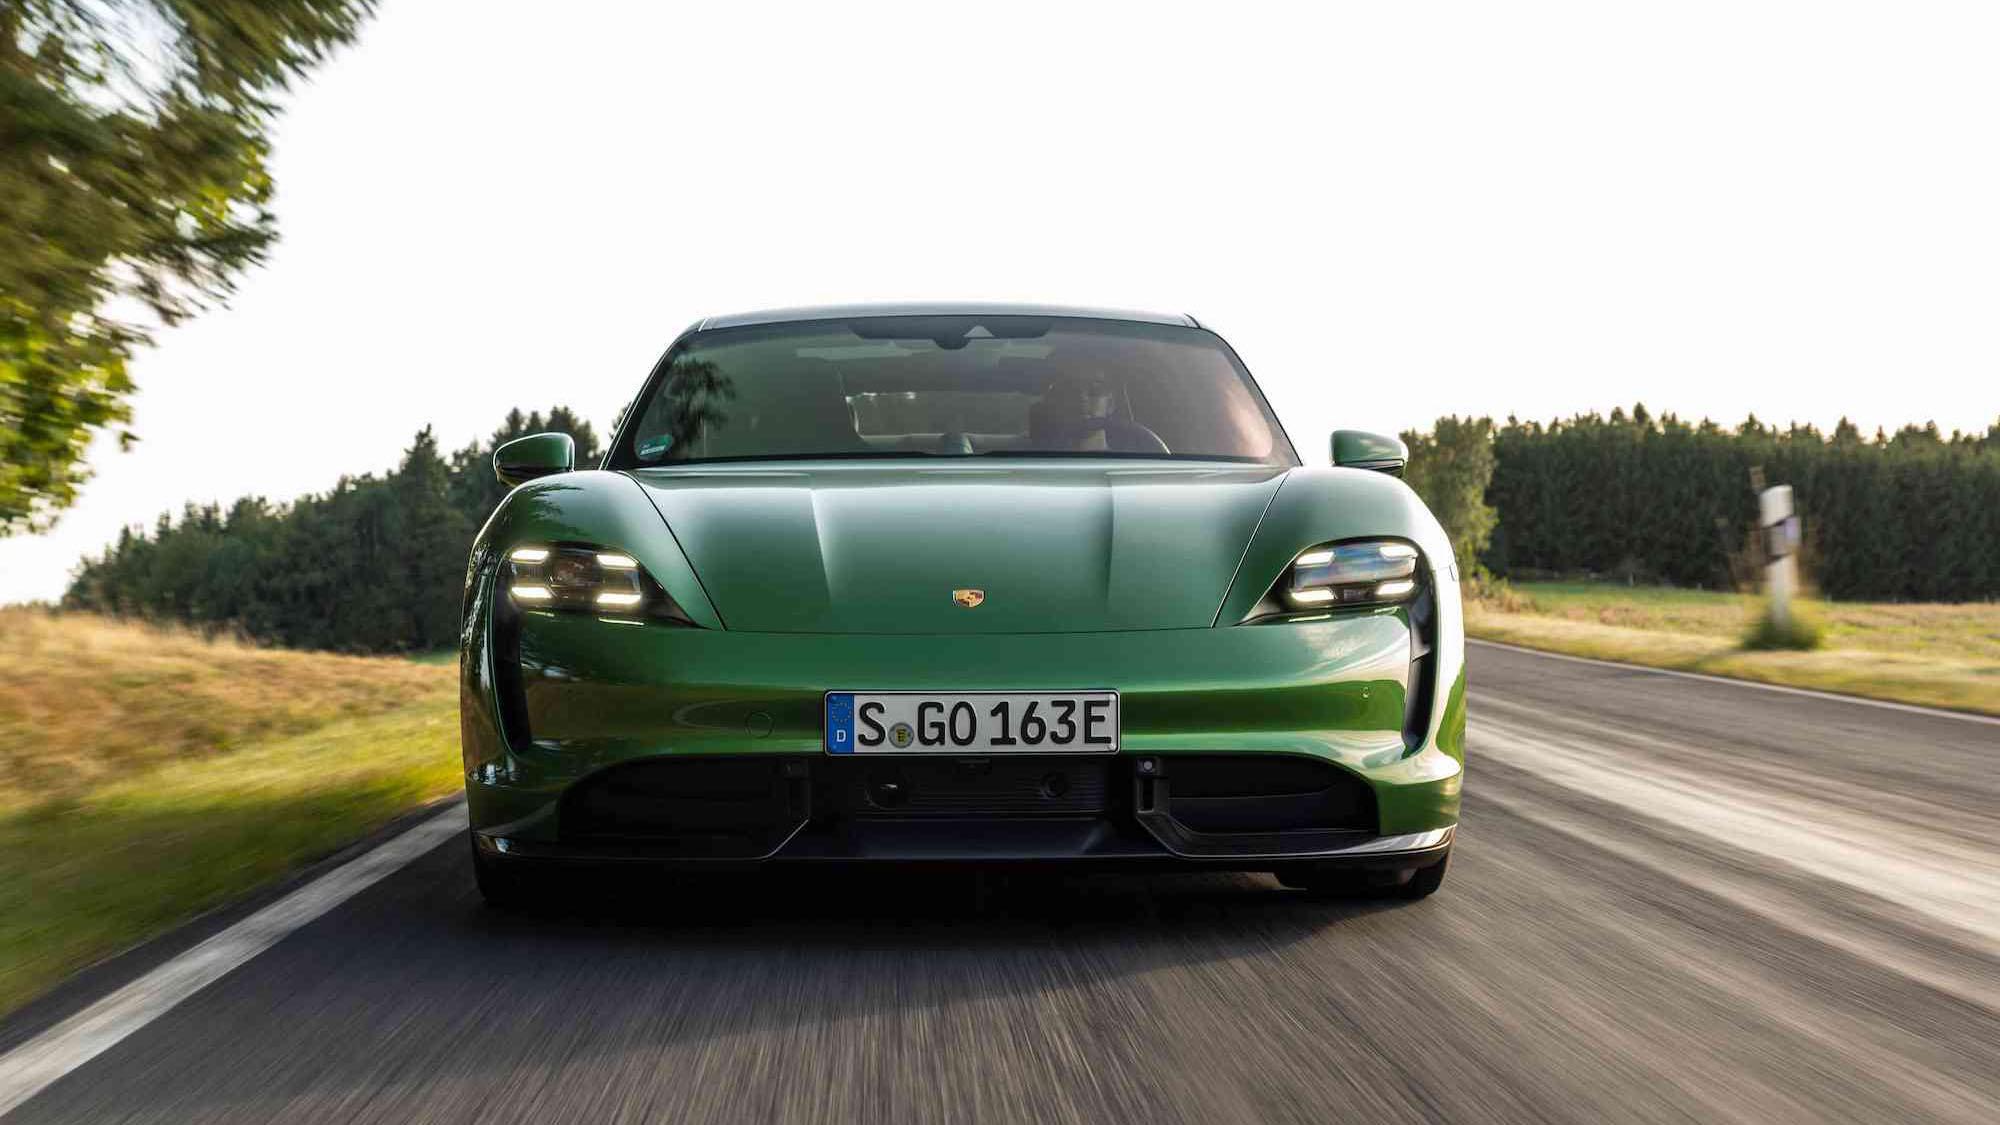 Porsche Taycan 獲世界年度風雲車雙桂冠,911 不遑多讓!